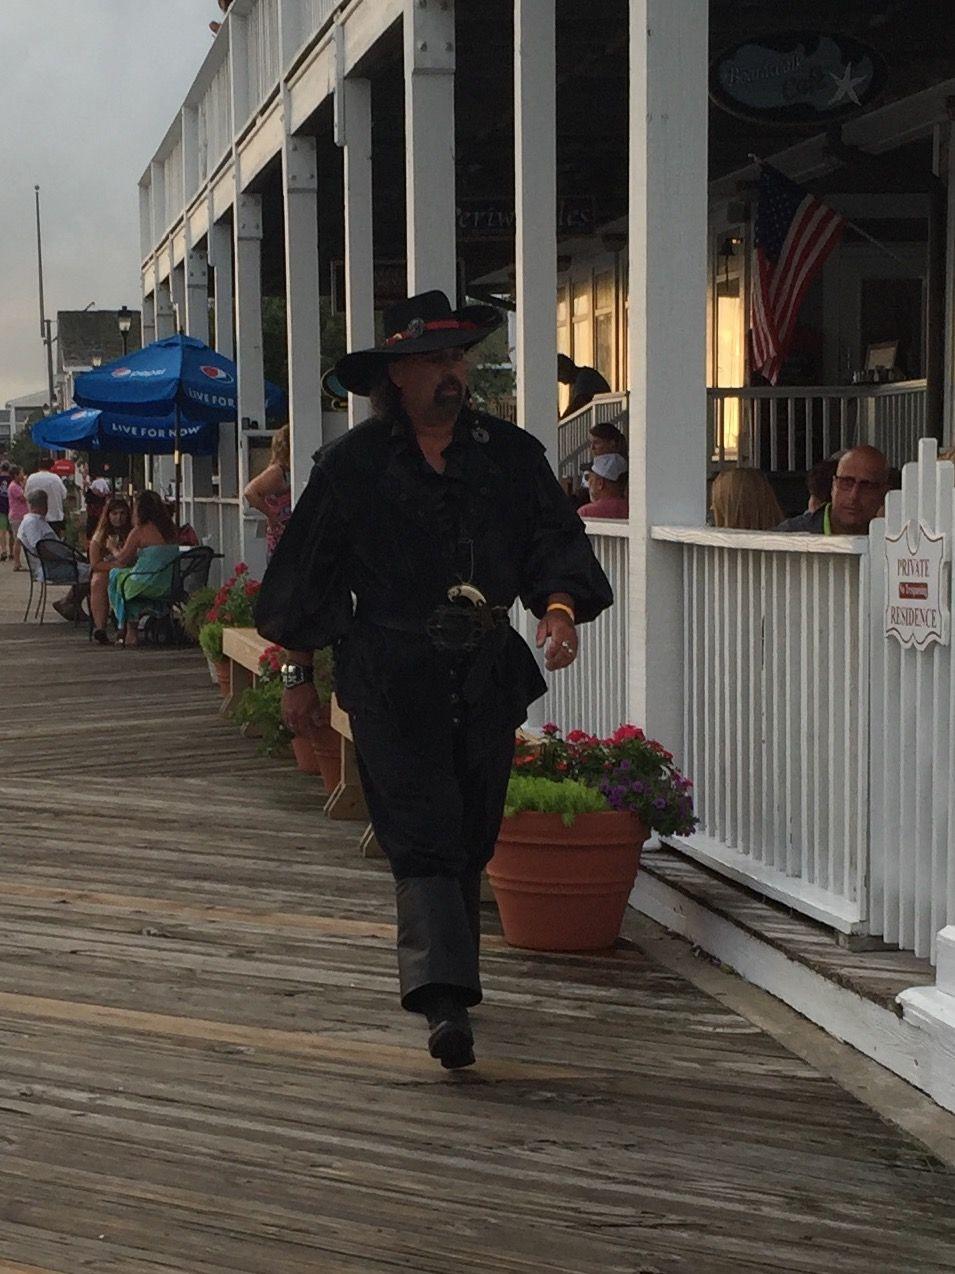 Pirate invasion @Beaufort, NC 2015